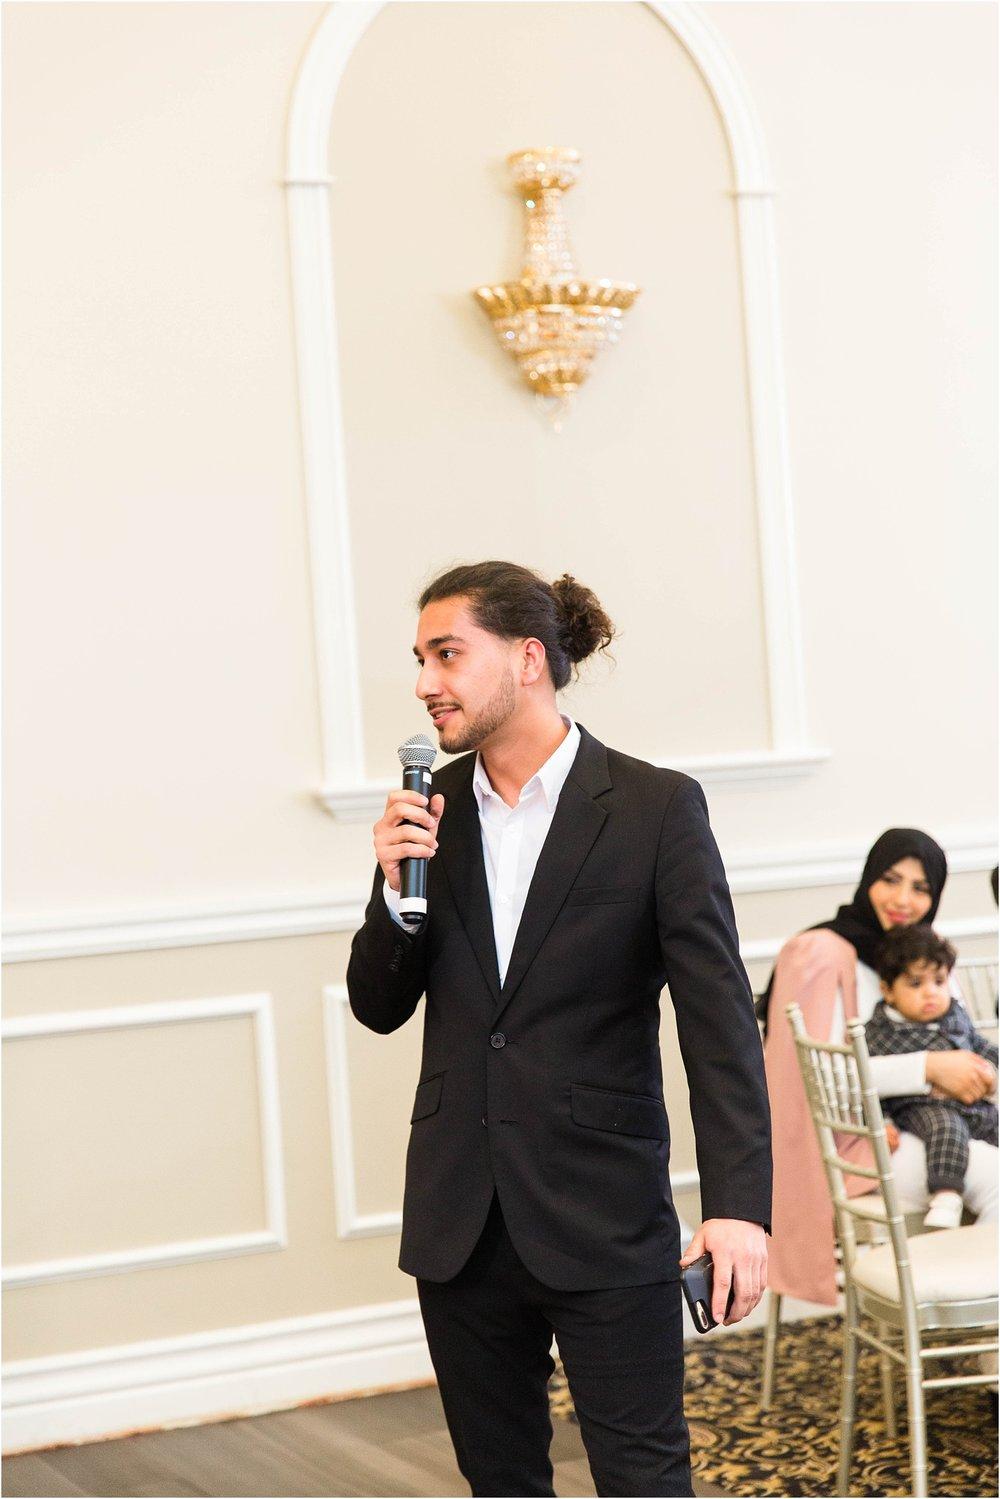 Red-Rose-Convention-Mint-Room-Wedding-Toronto-Mississauga-Brampton-Scarborough-GTA-Pakistani-Indian-Wedding-Engagement-Photographer-Photography_0148.jpg